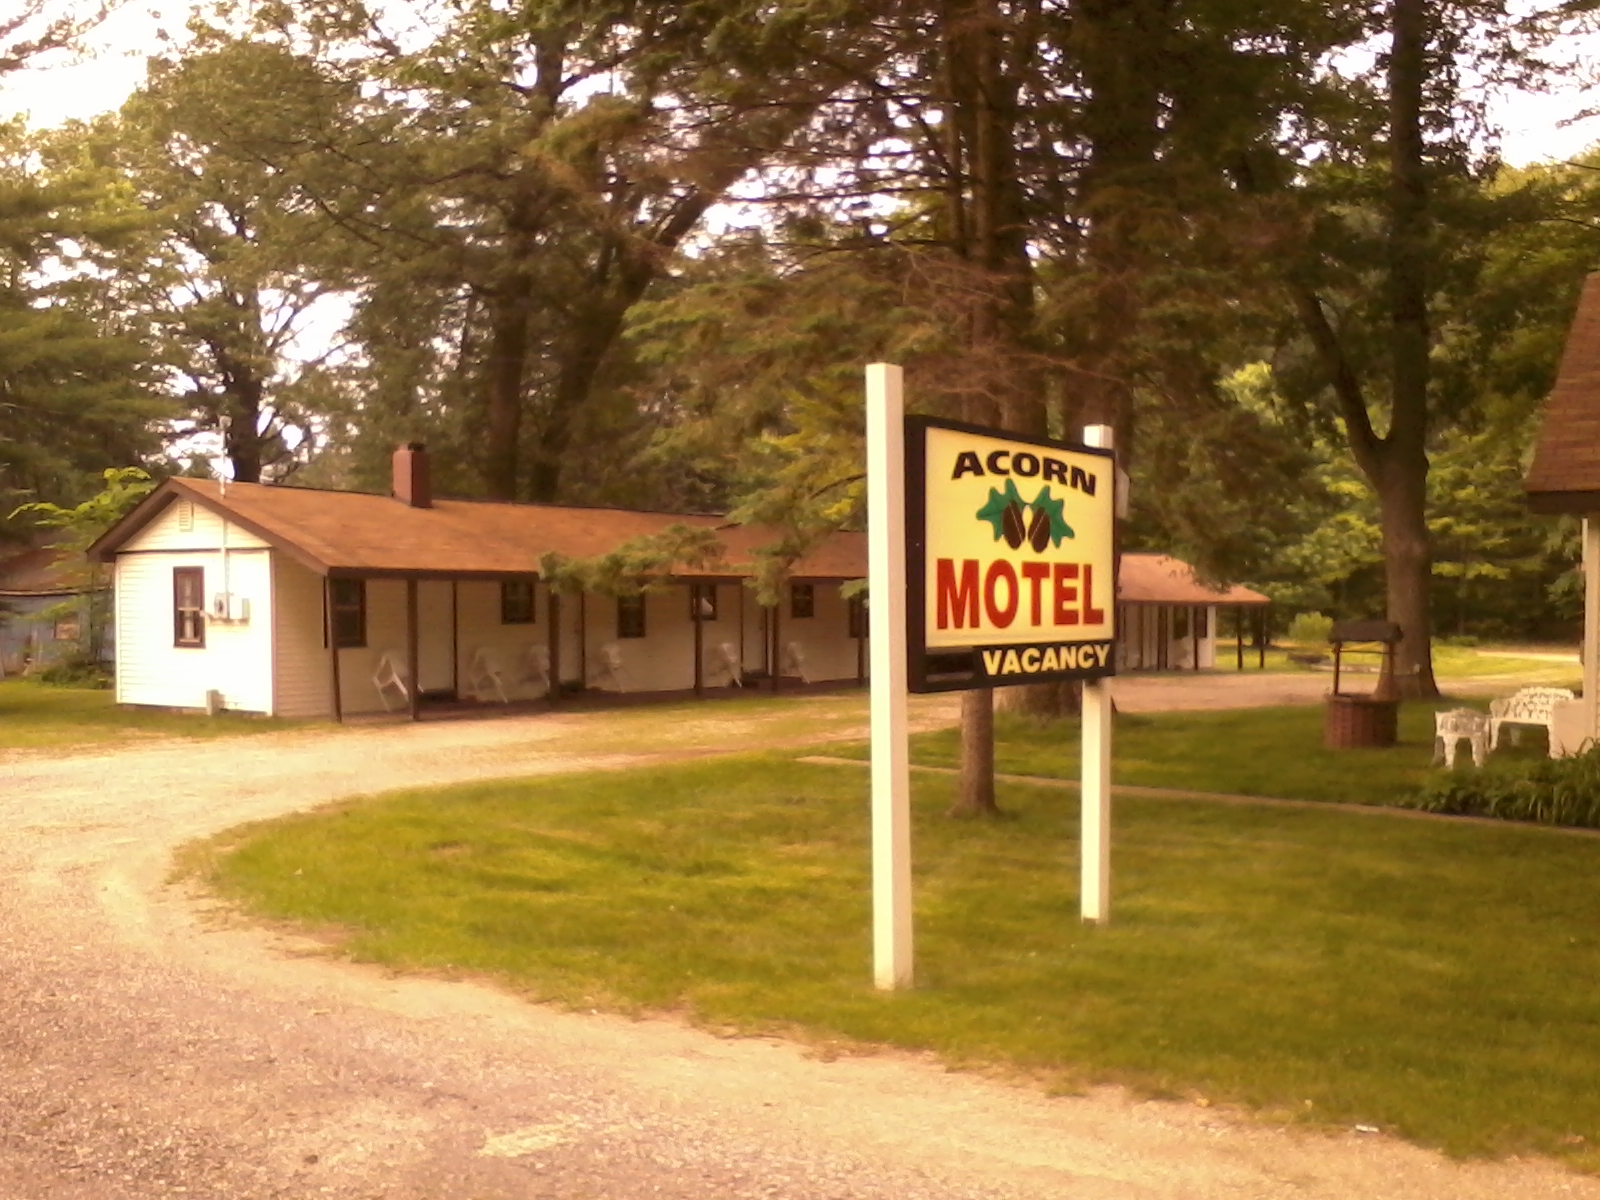 Acorn Motel, Harrison MI